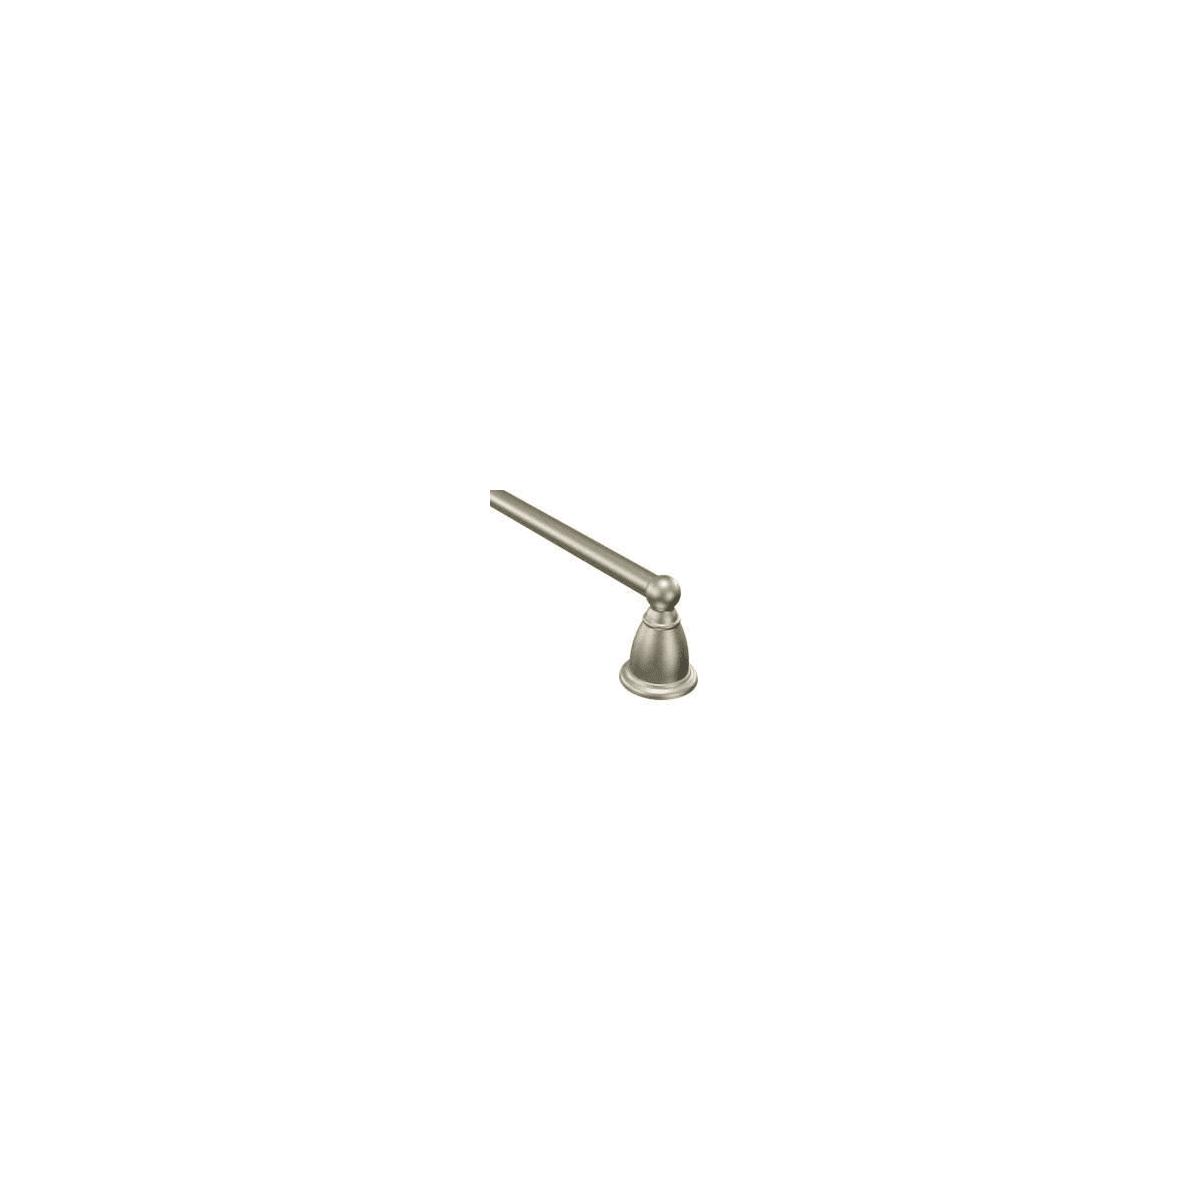 "Moen YB2218BN Brantford 18/"" Bathroom Towel Bar Holder Traditional Brushed Nickel"